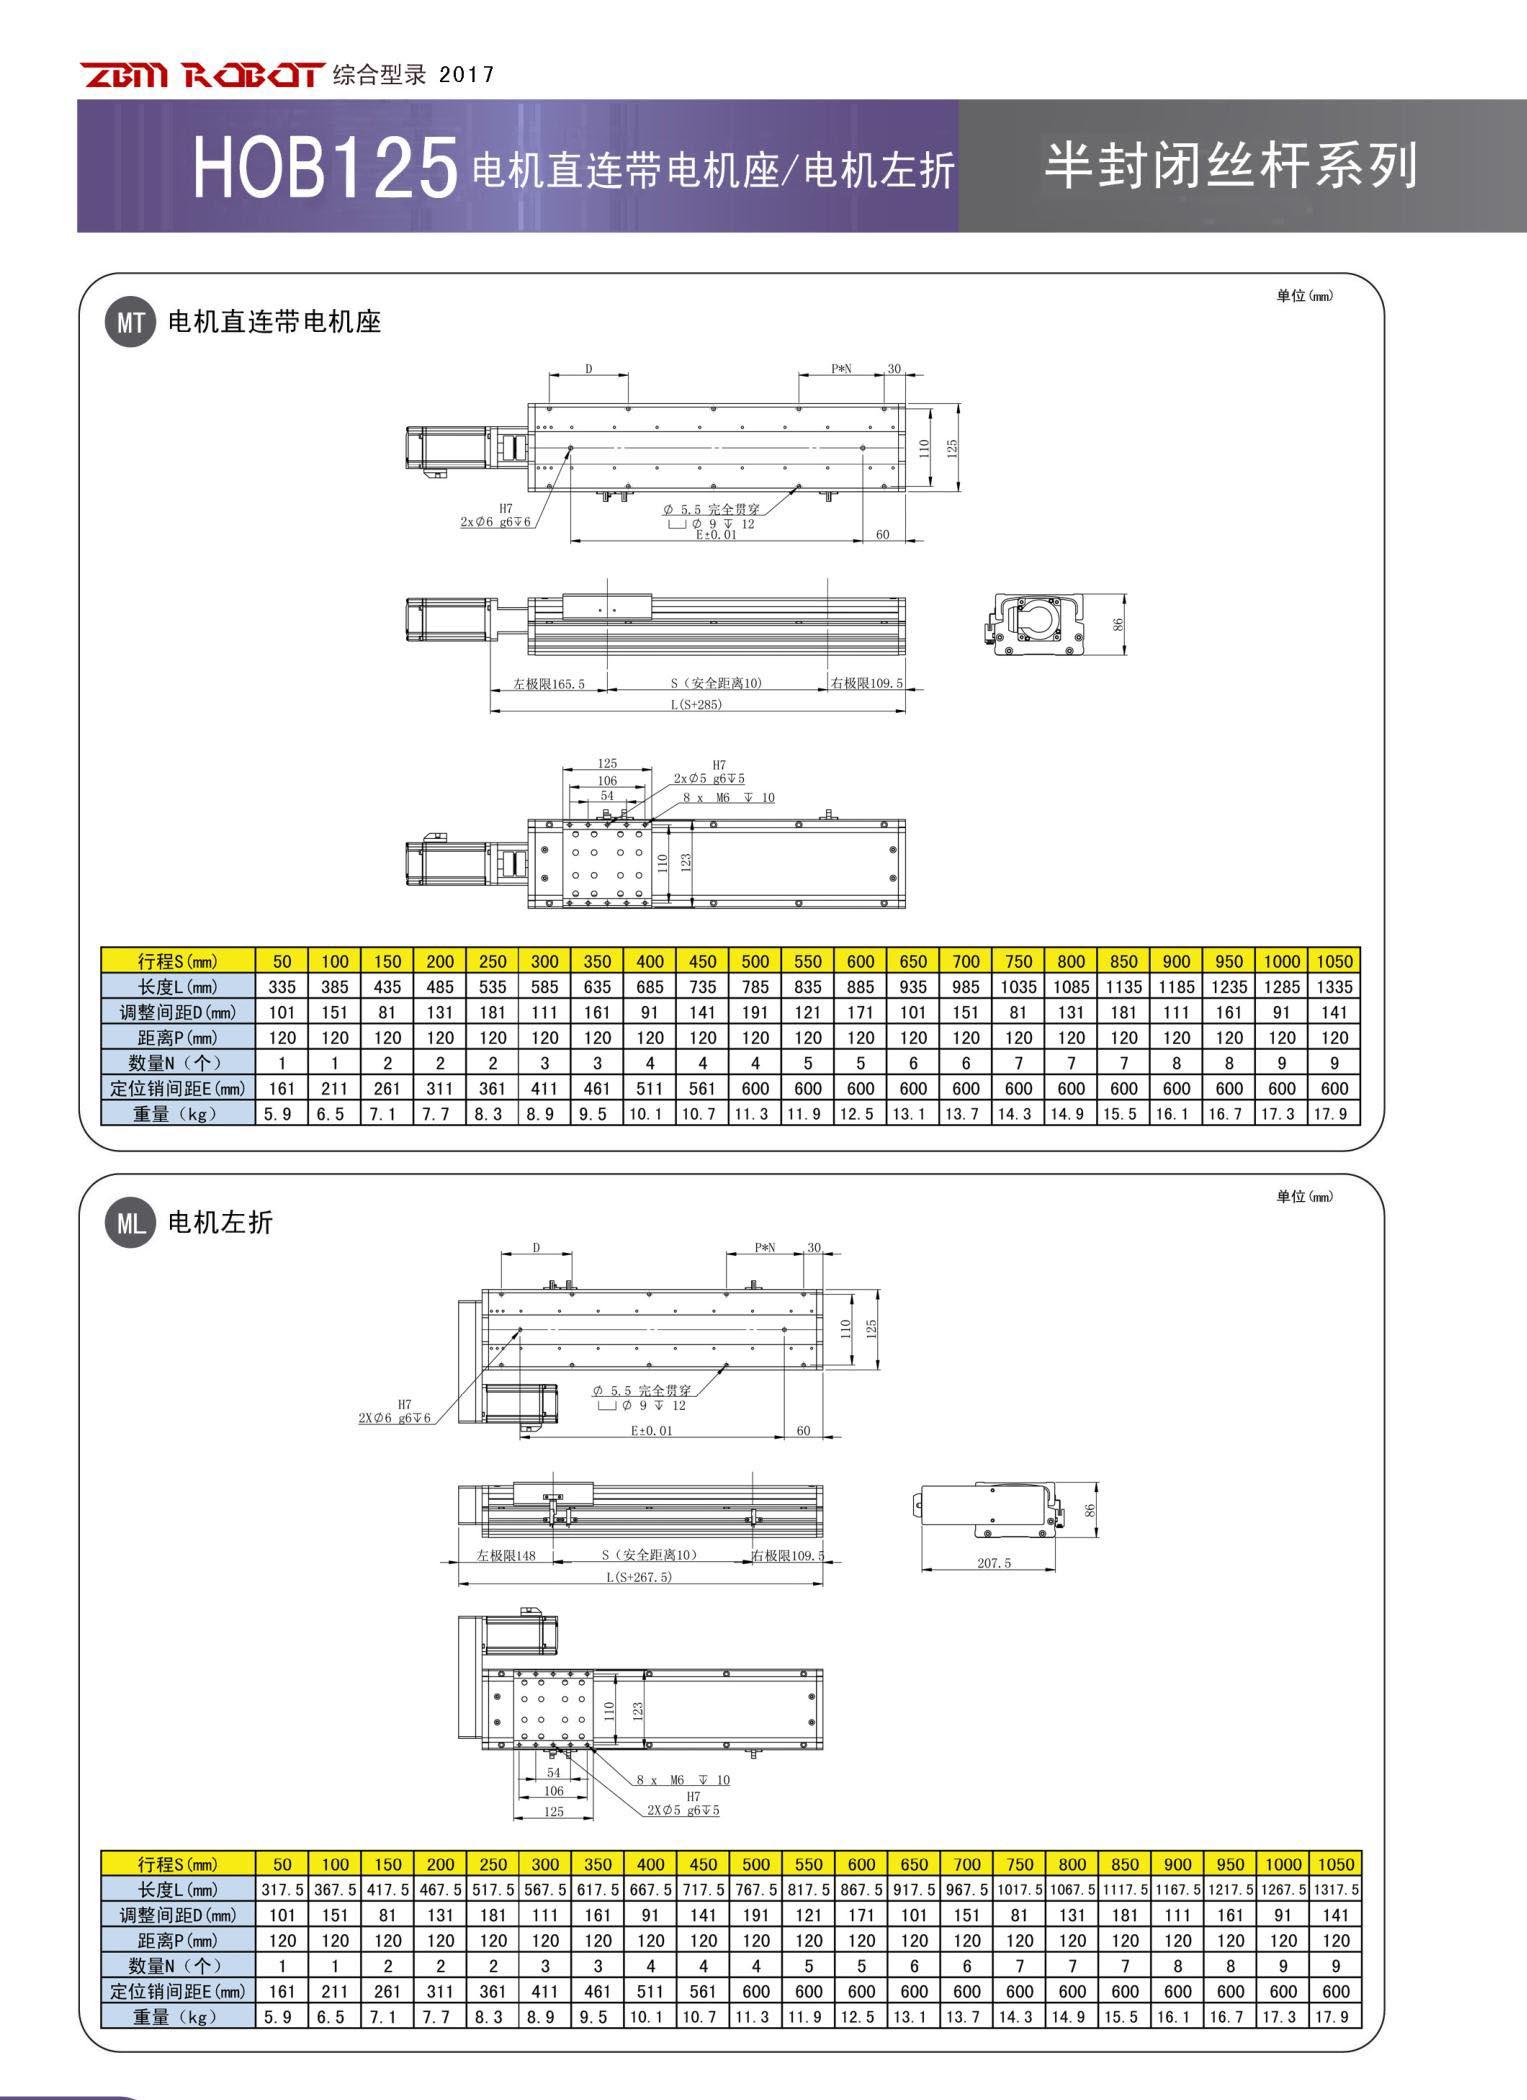 HOB125S-CM|半封闭丝杆模组-宝马娱乐在线1211app